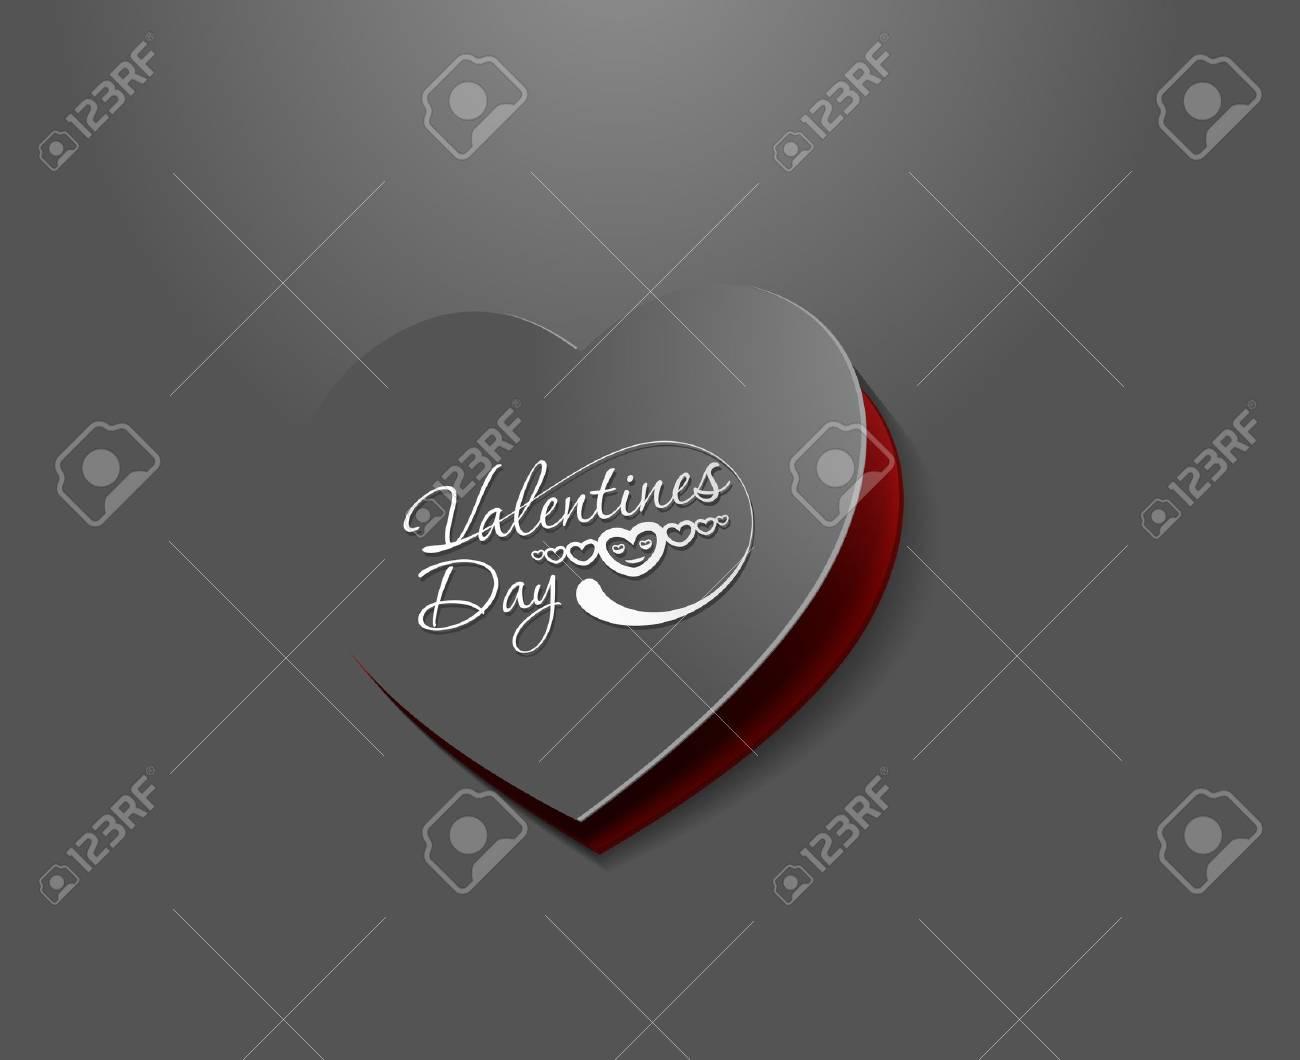 valentine's day background, vector illustration. Stock Vector - 12125612